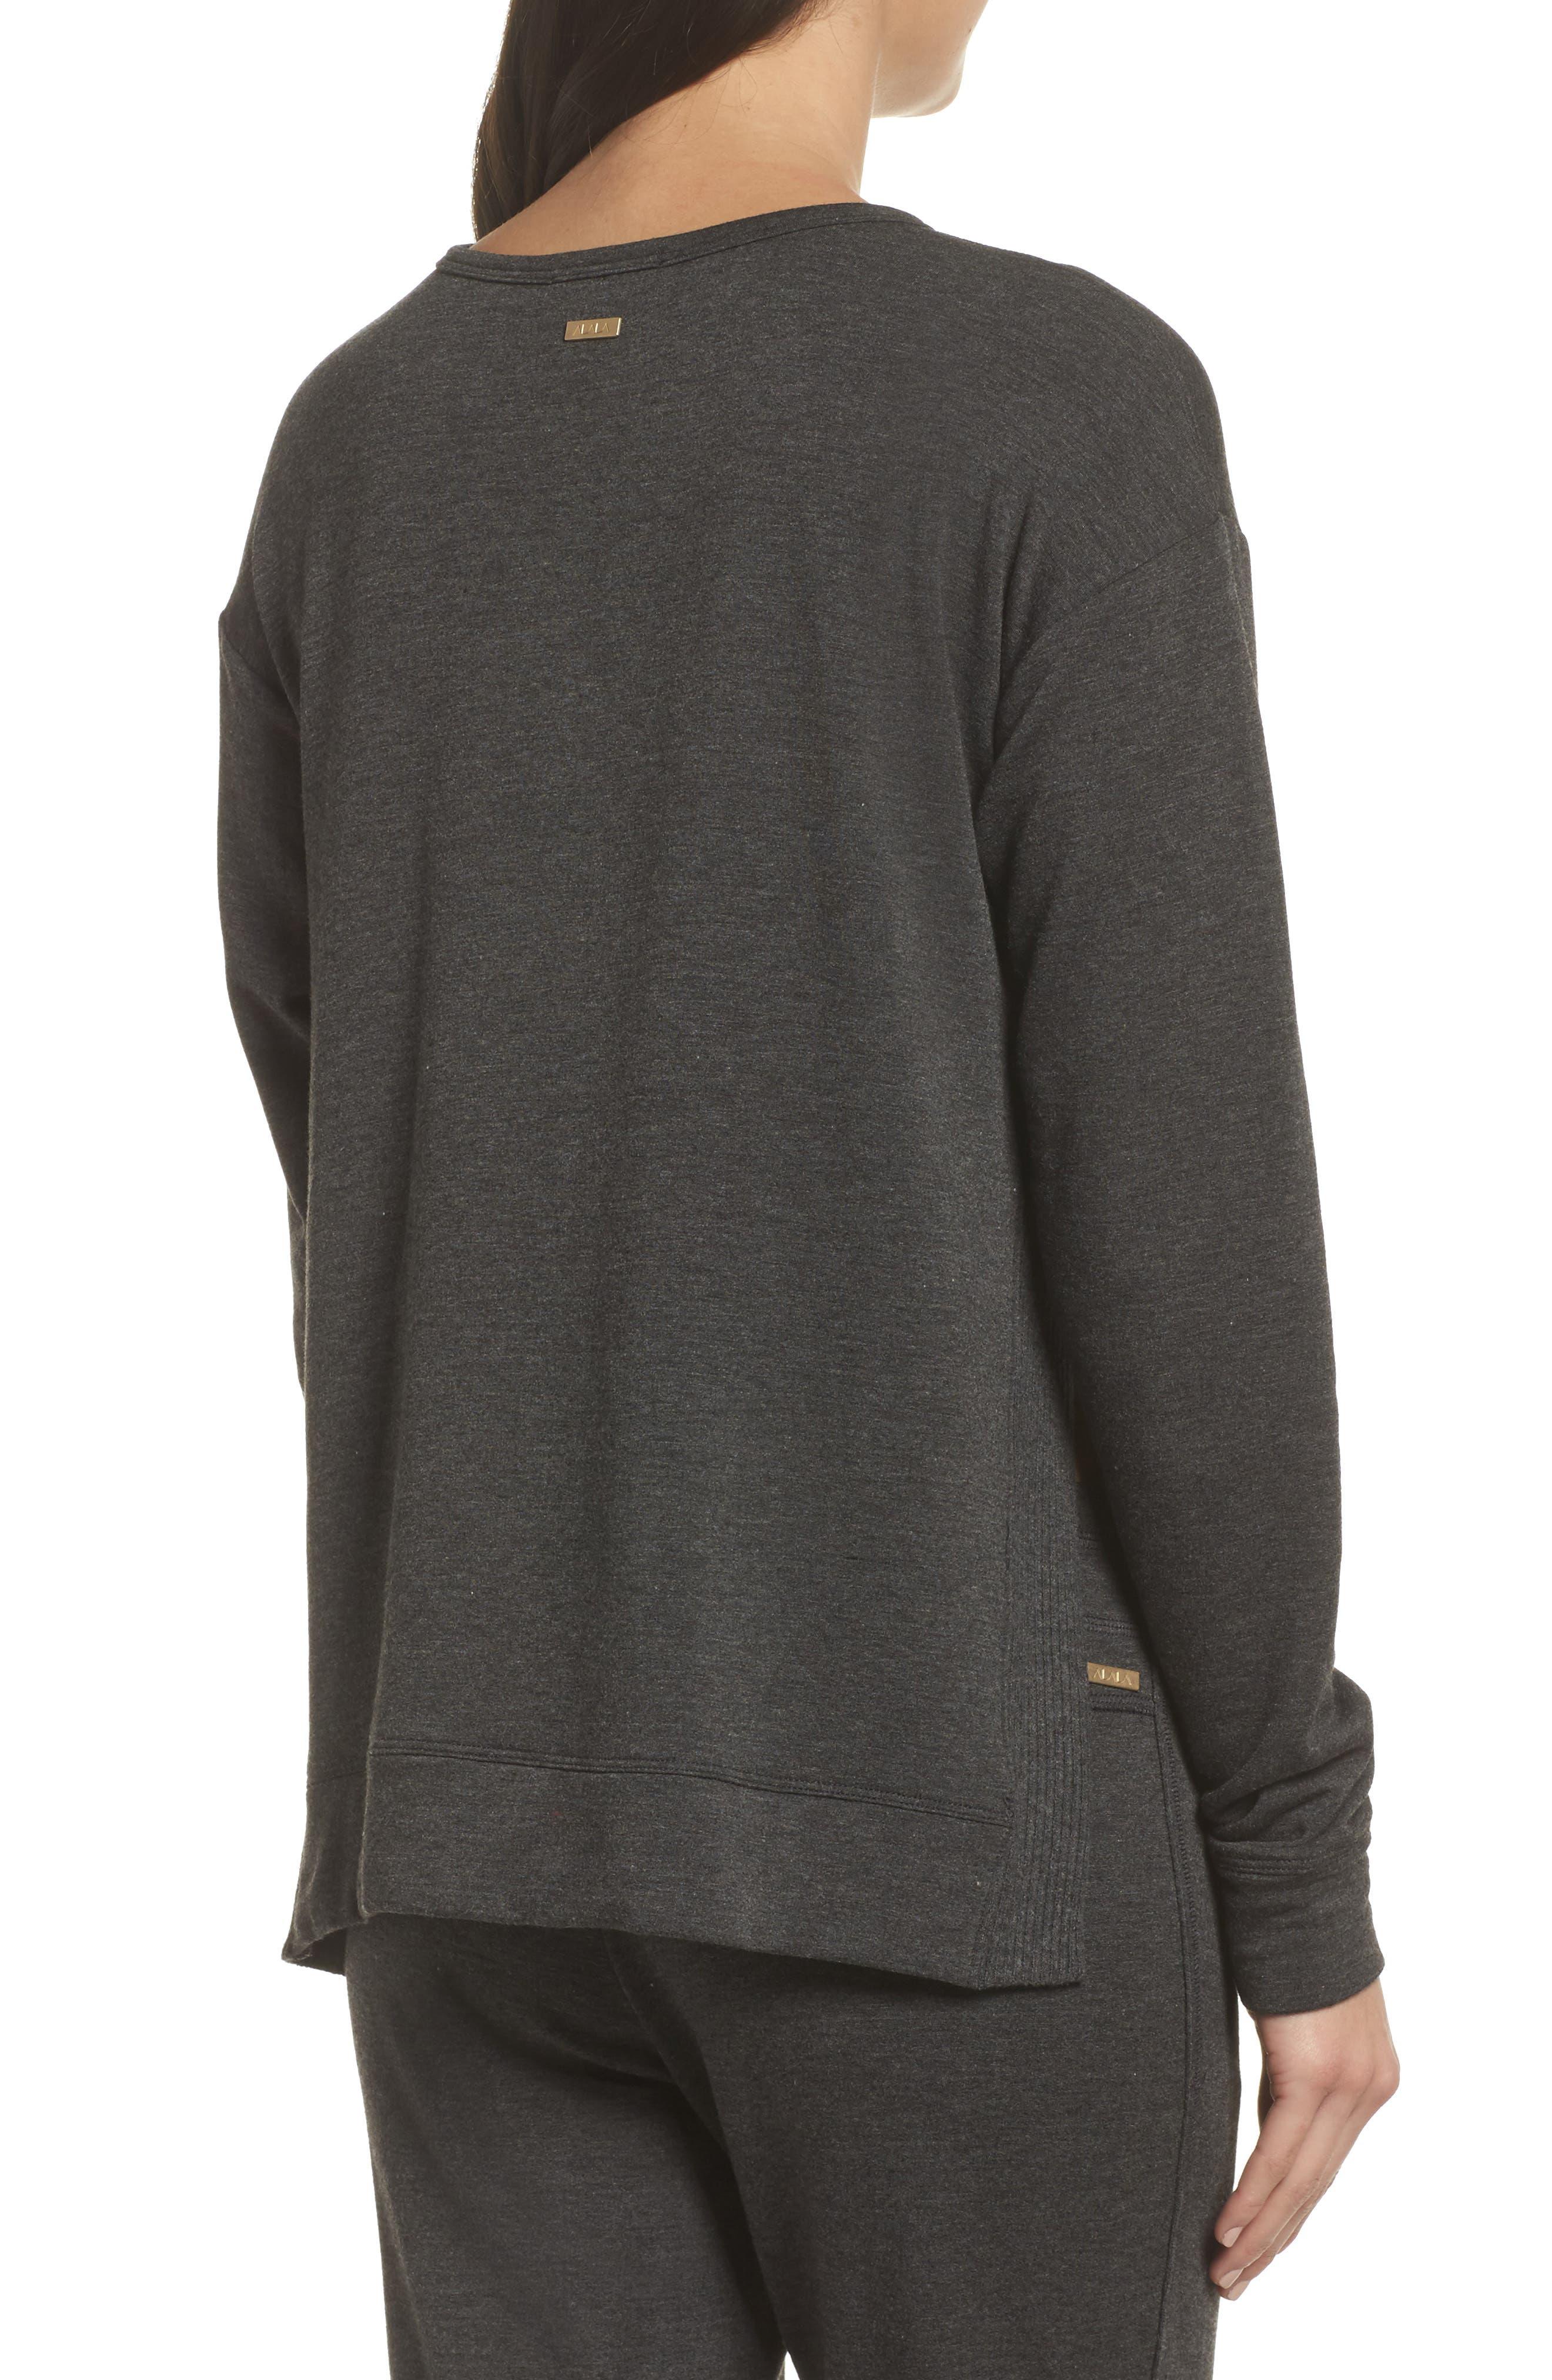 Crane Sweatshirt,                             Alternate thumbnail 2, color,                             Charcoal